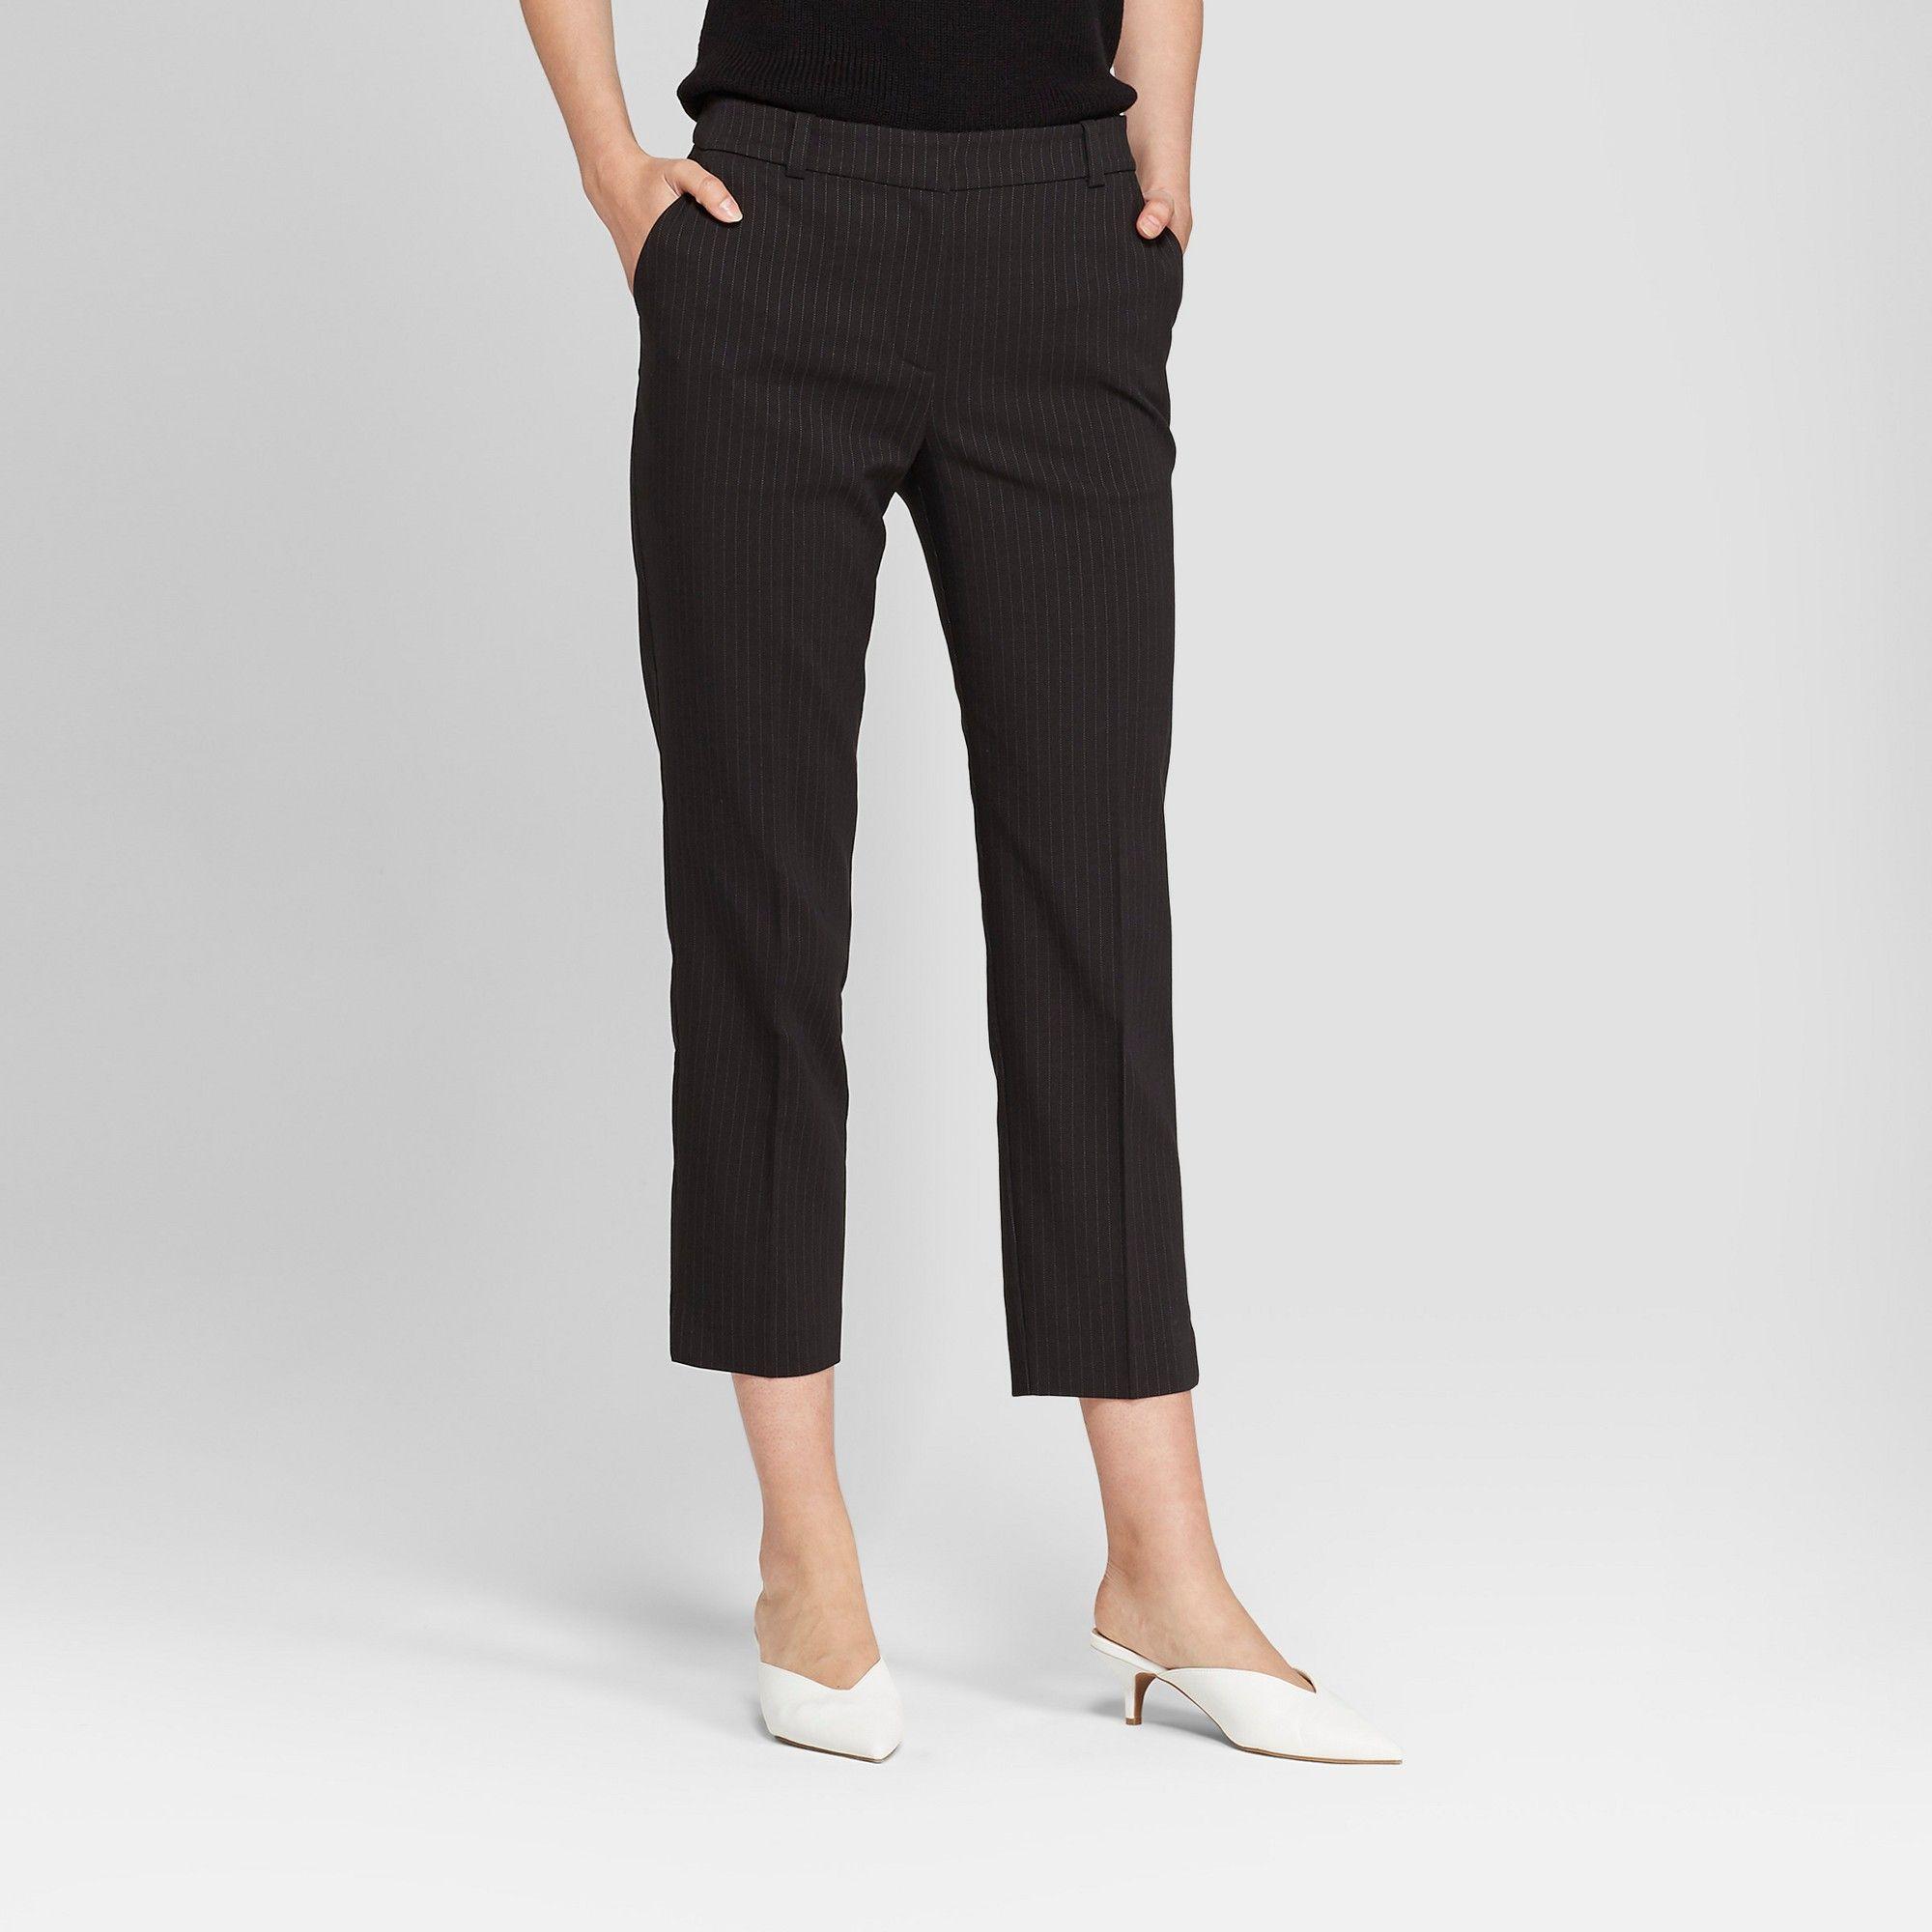 "eb8e7b708ac9f Women s Side Vent Pull-On Pencil Skirt - Prologueâ"" 20Brown M  Vent ..."